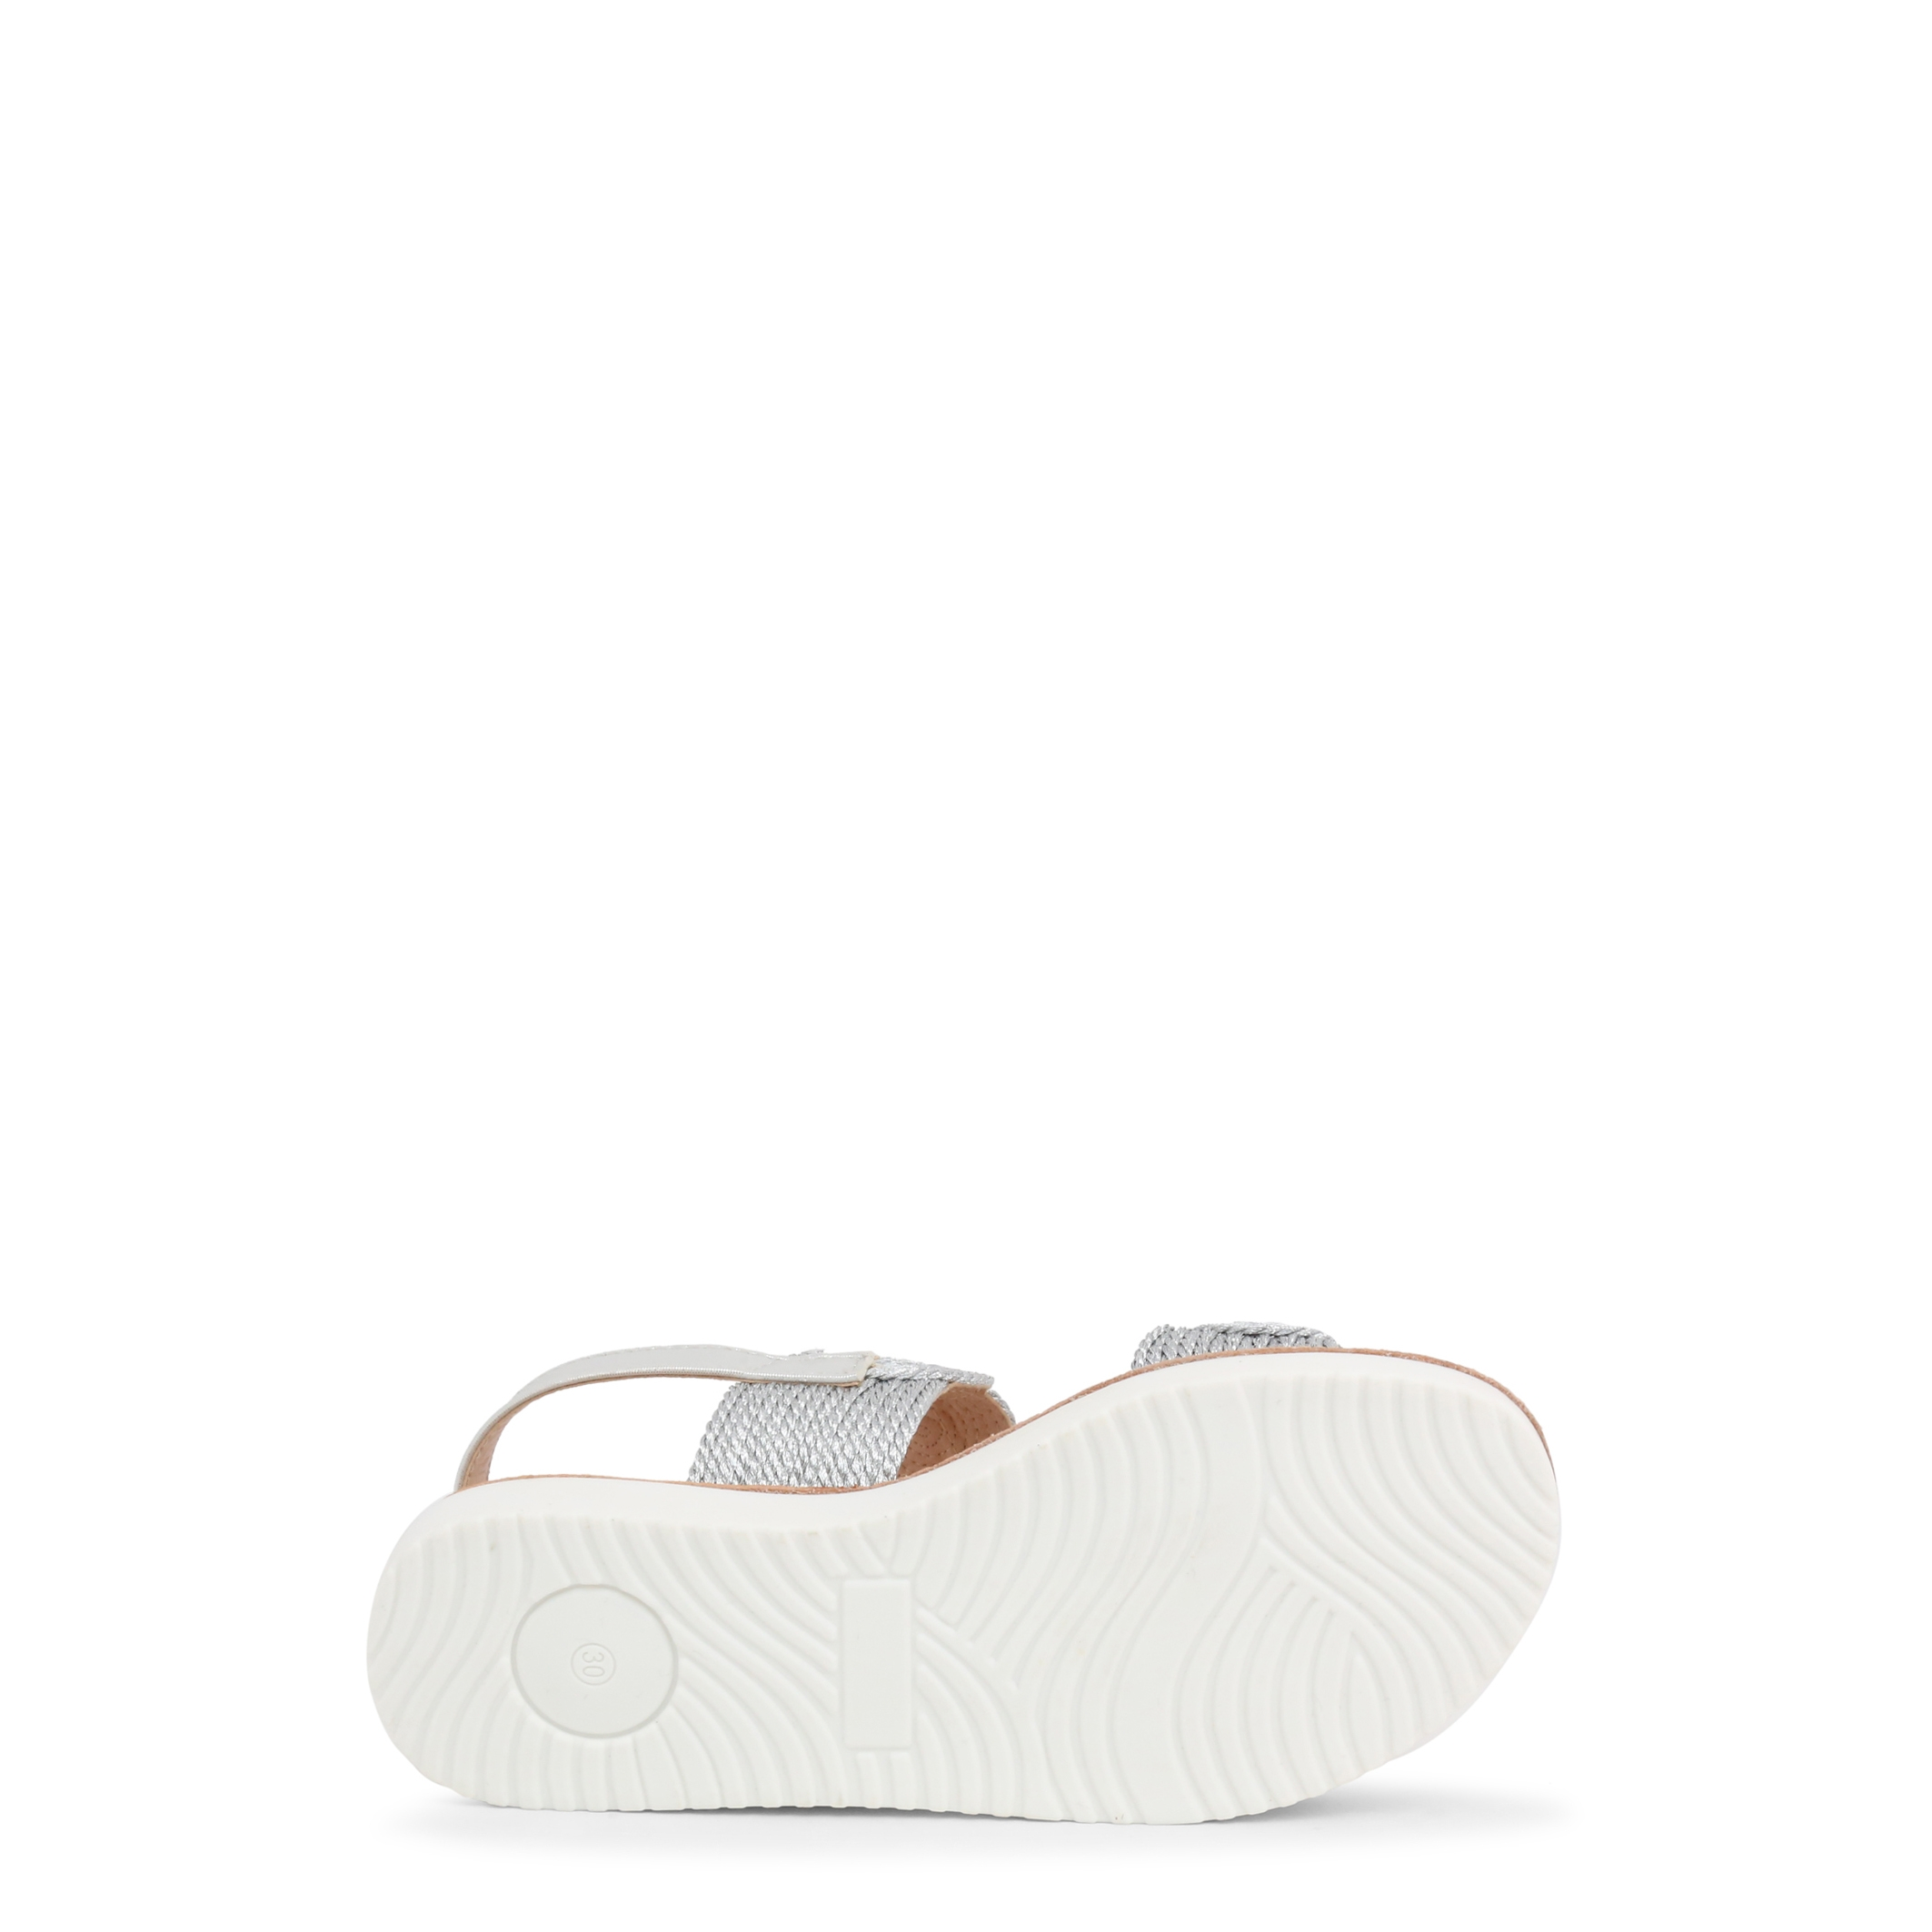 Sandale Miss Sixty MS786 Gri